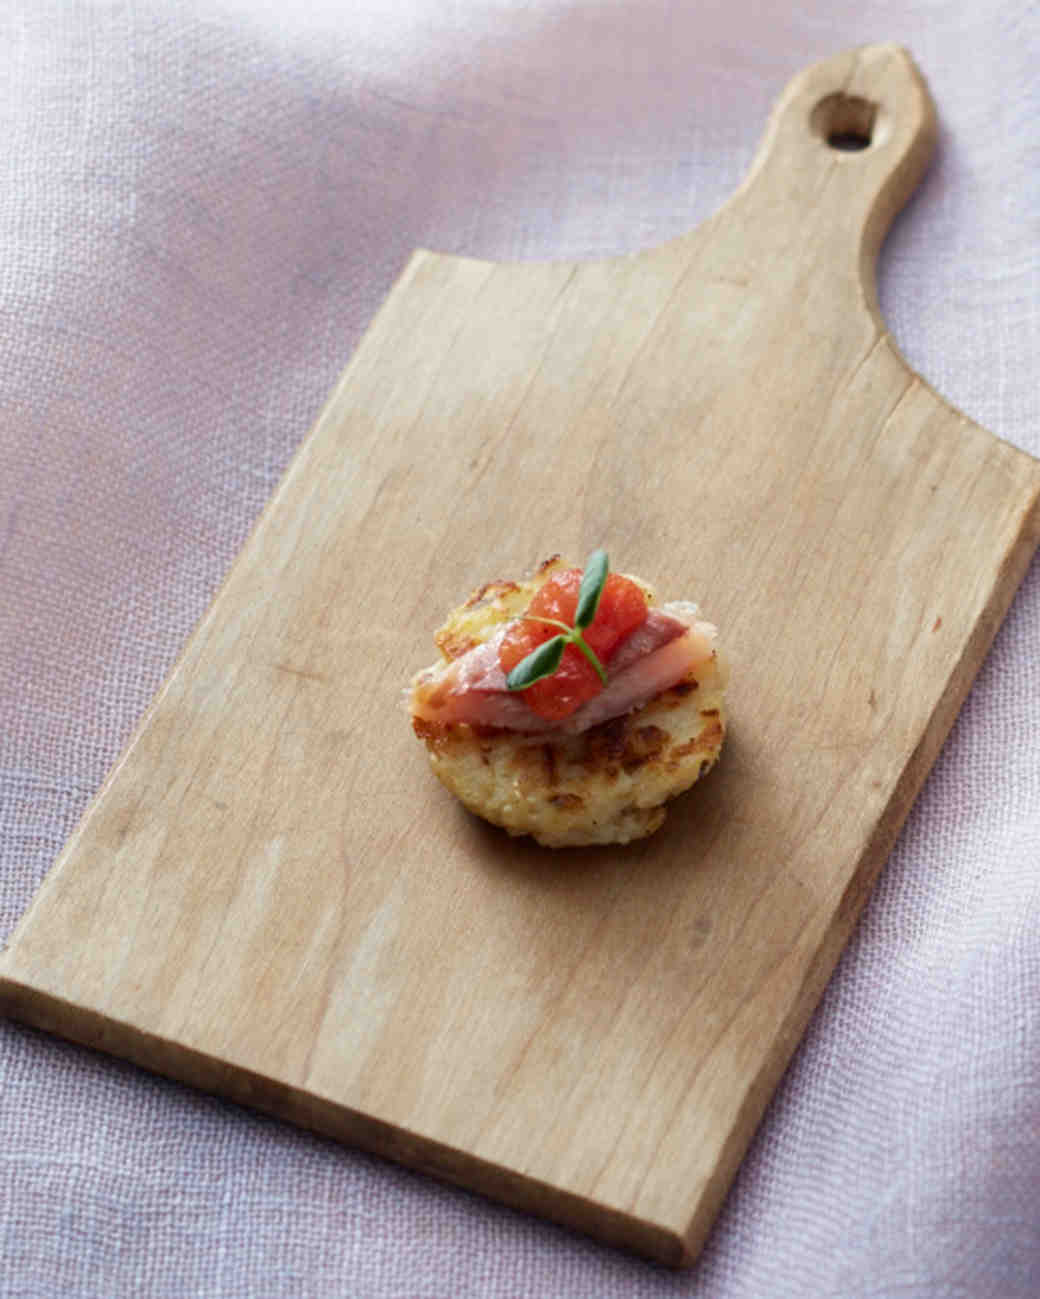 gluten-free-appetizers-smoked-trout-potato-pancakes-072-d112317-fallsip15-1115.jpg